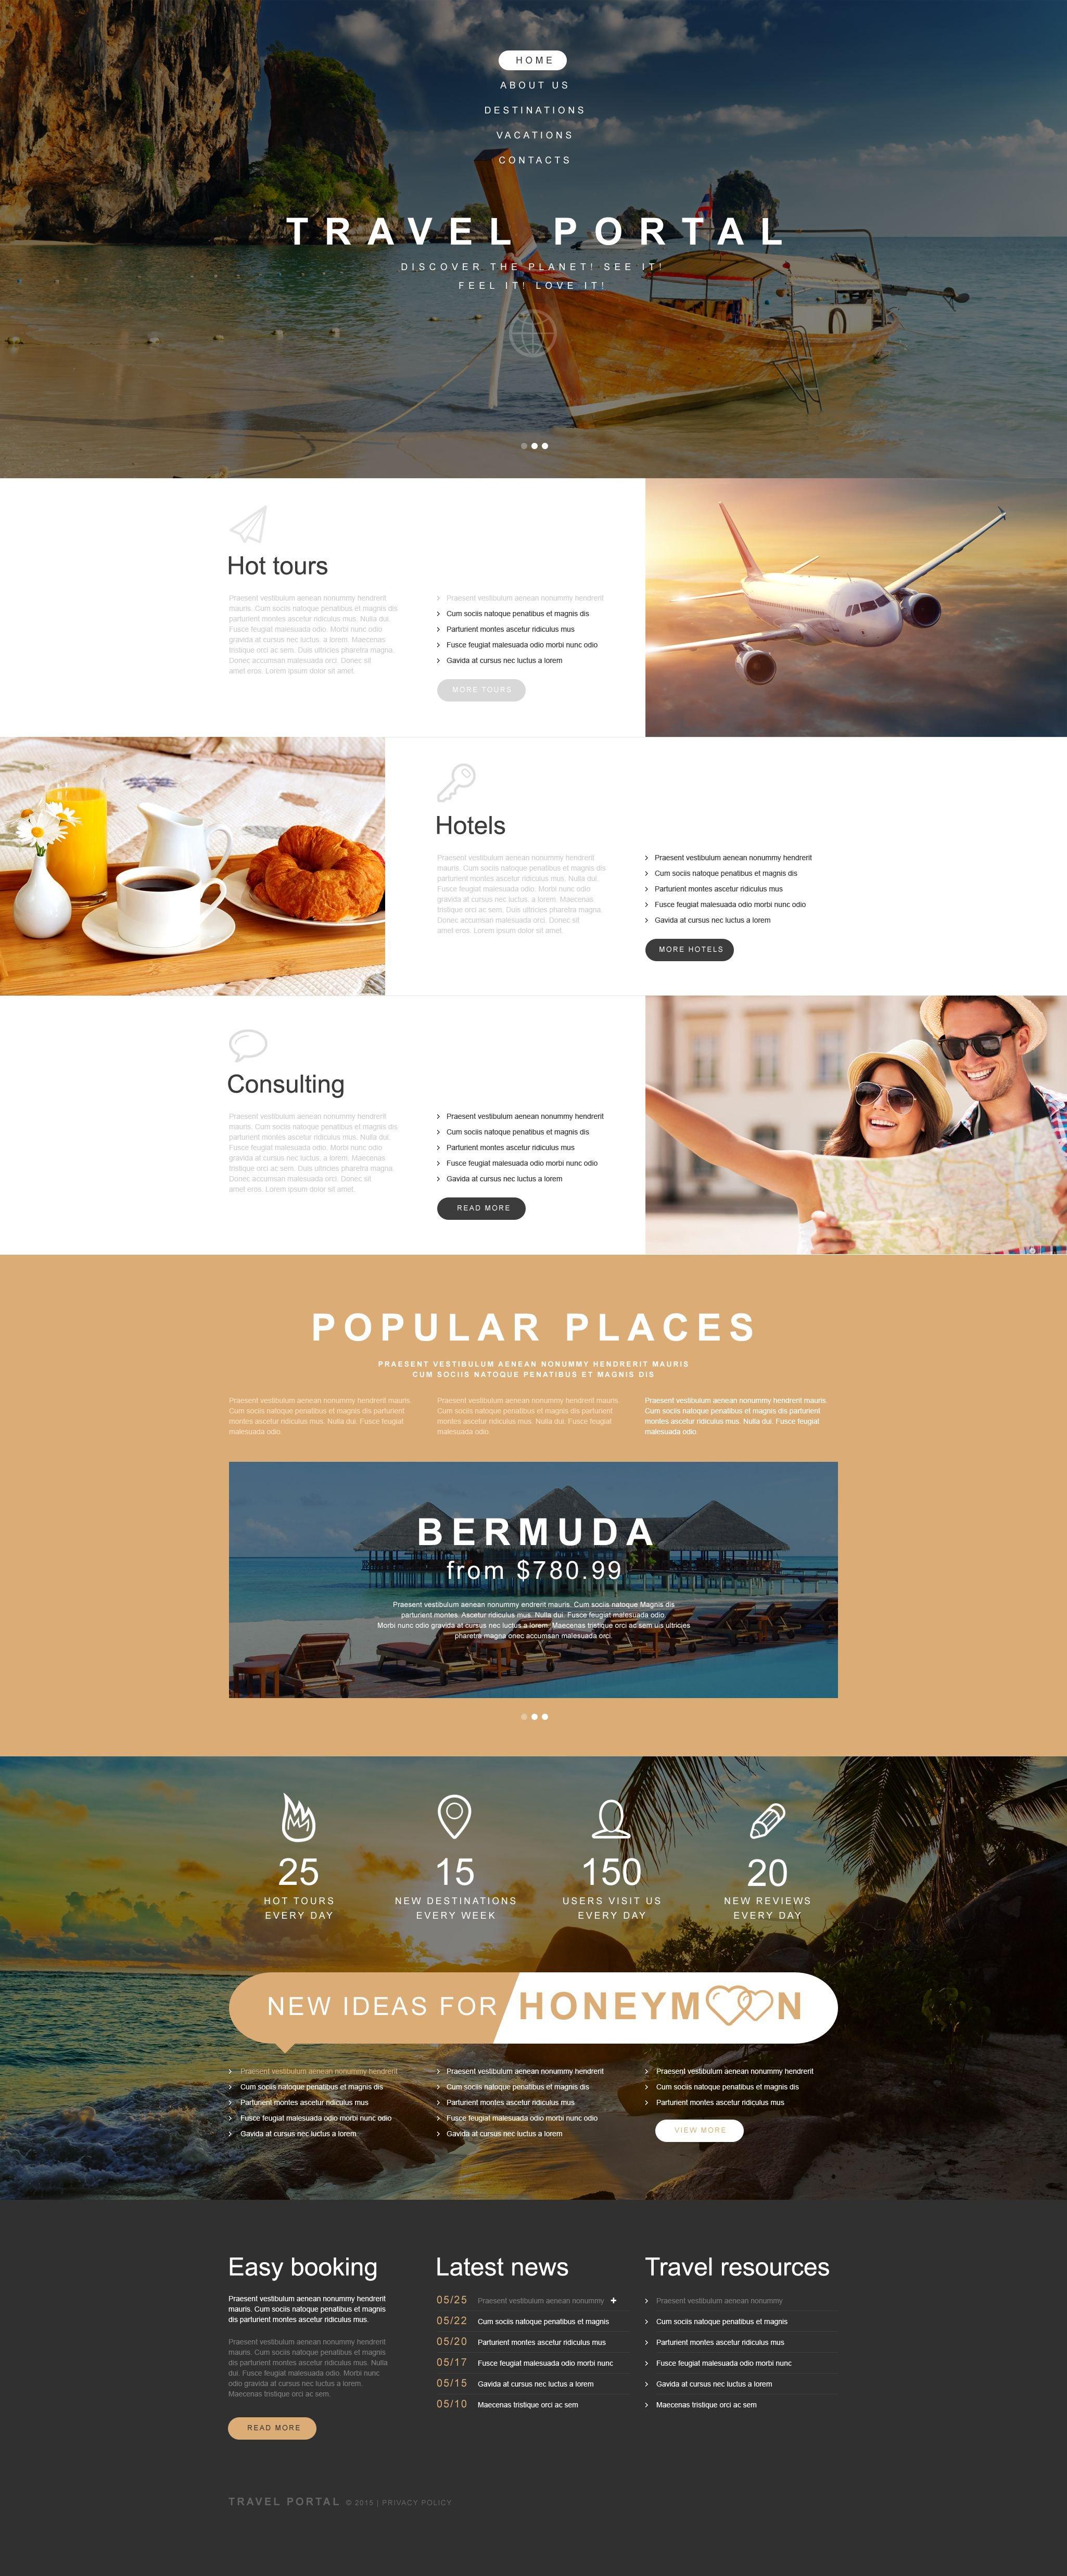 Travel Agency Muse Template - screenshot